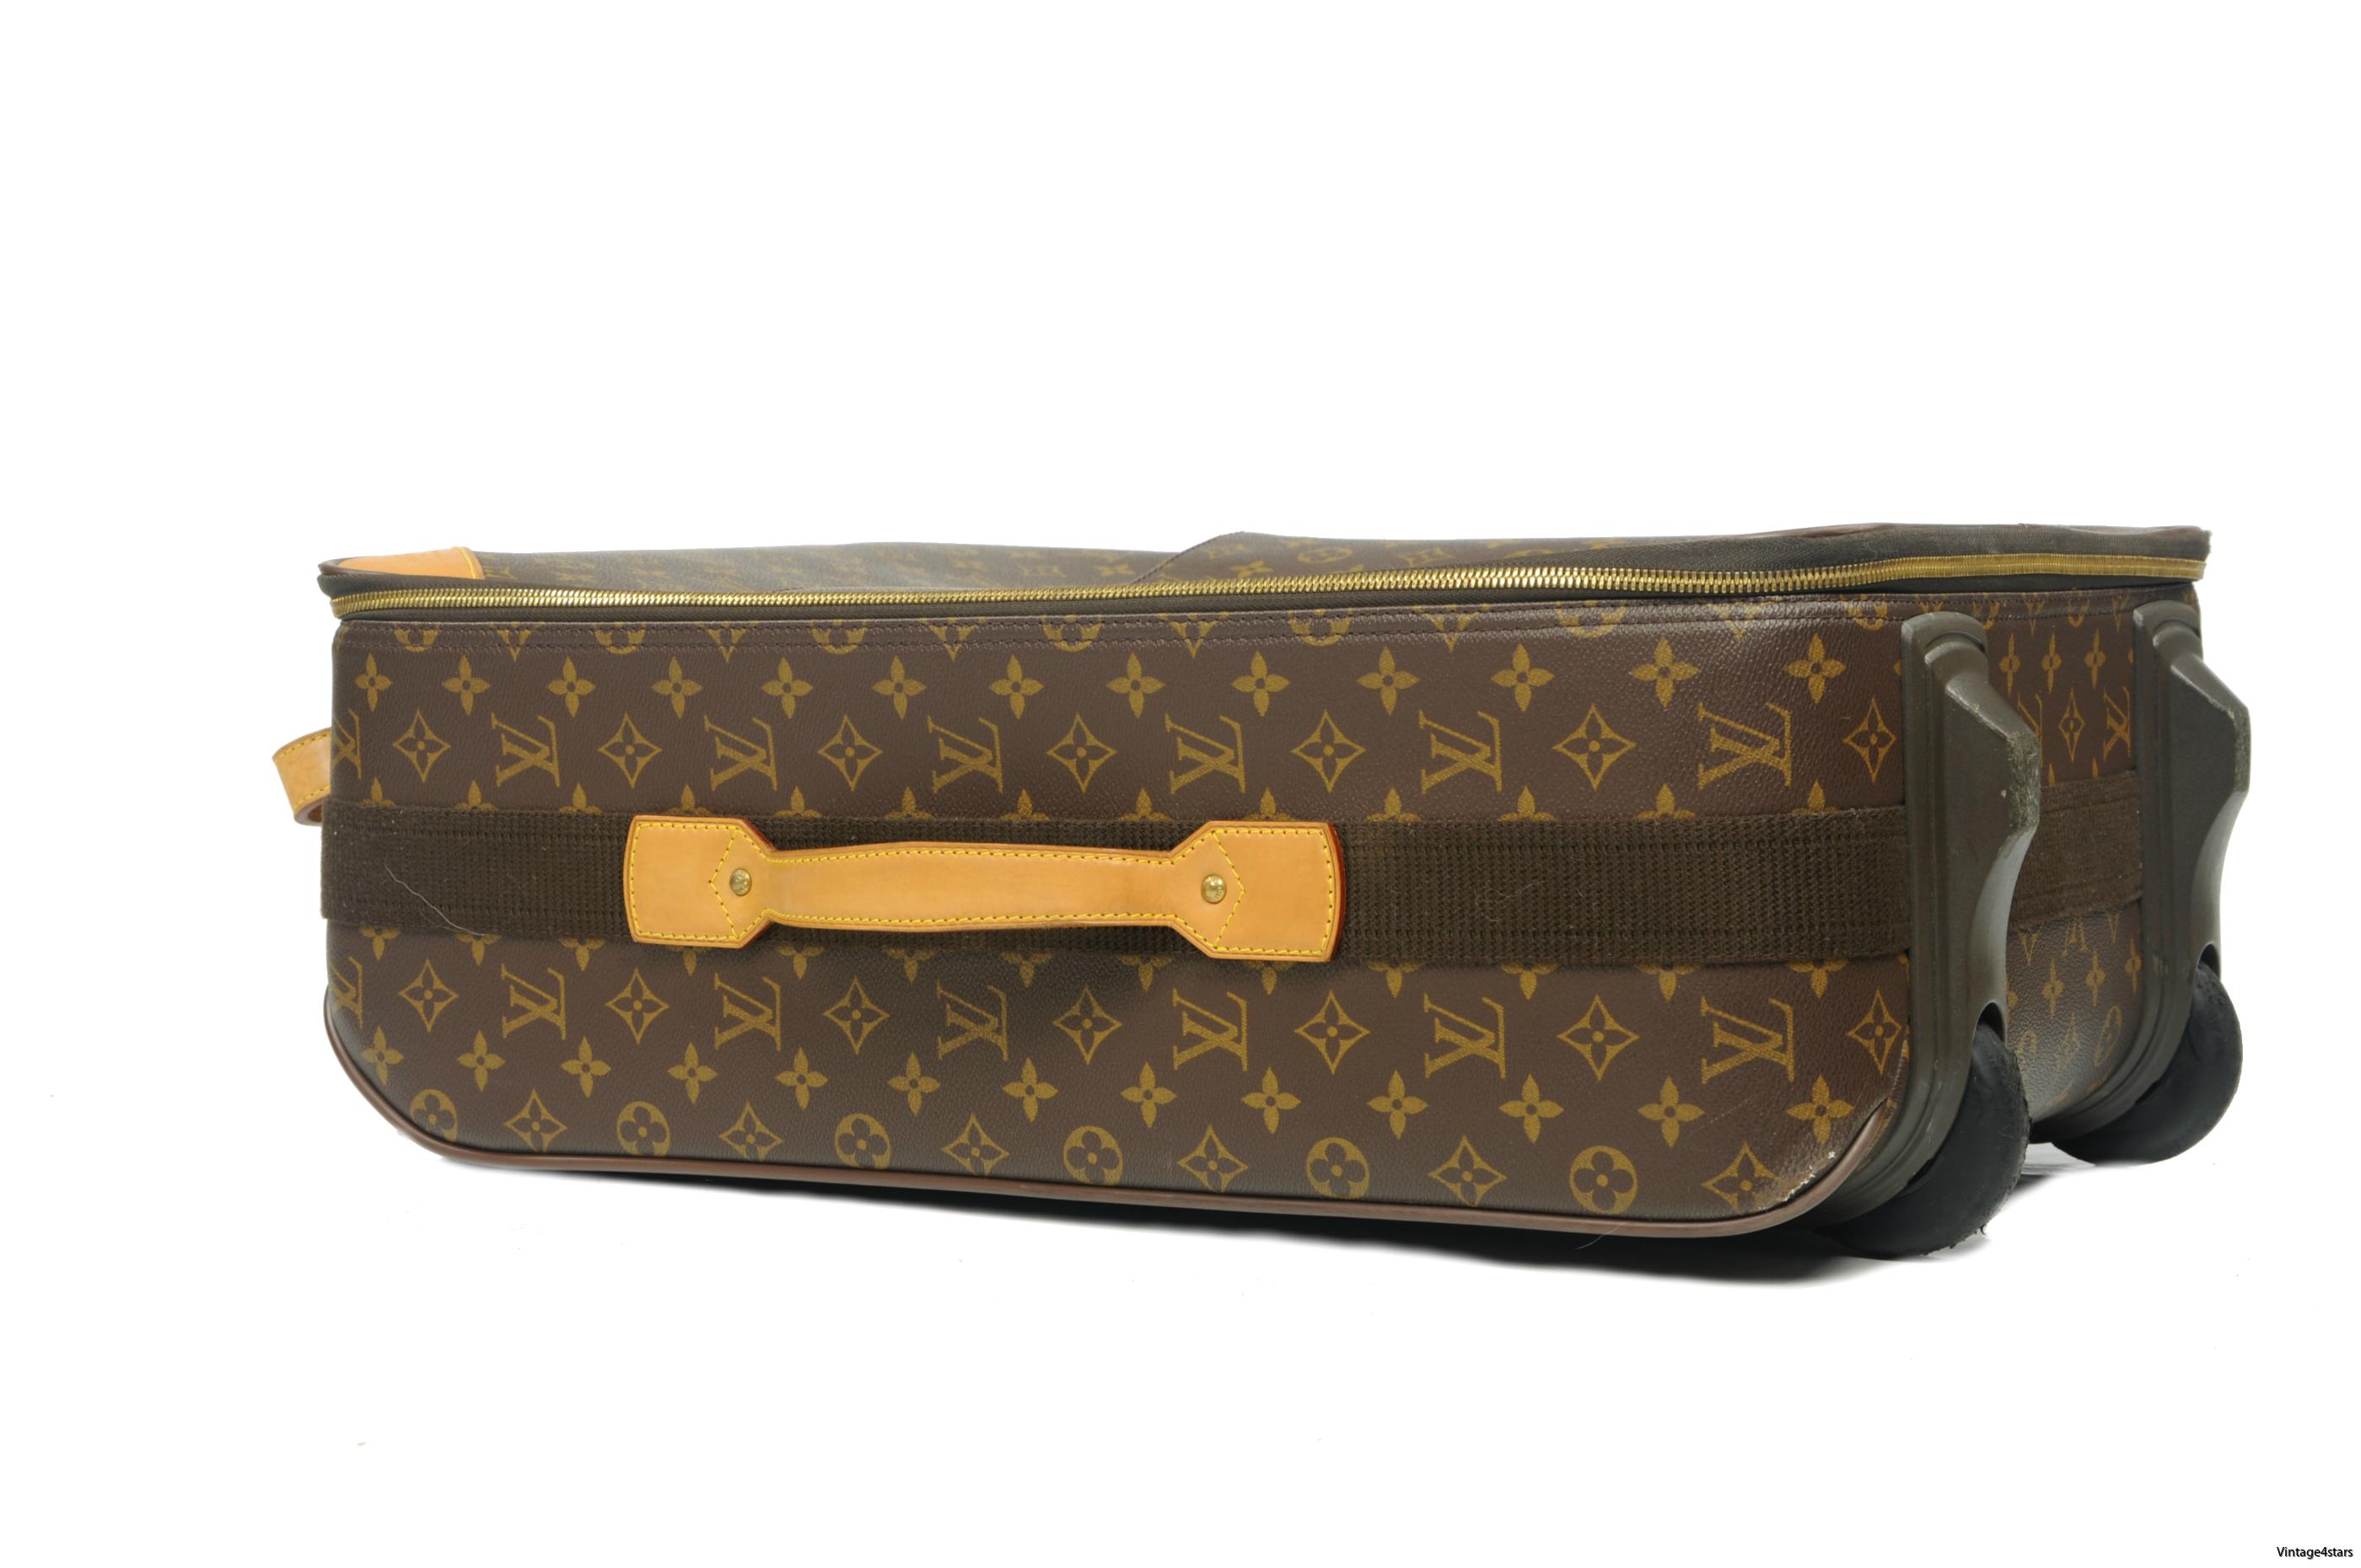 Louis Vuitton Pegase 55 Monogram 1